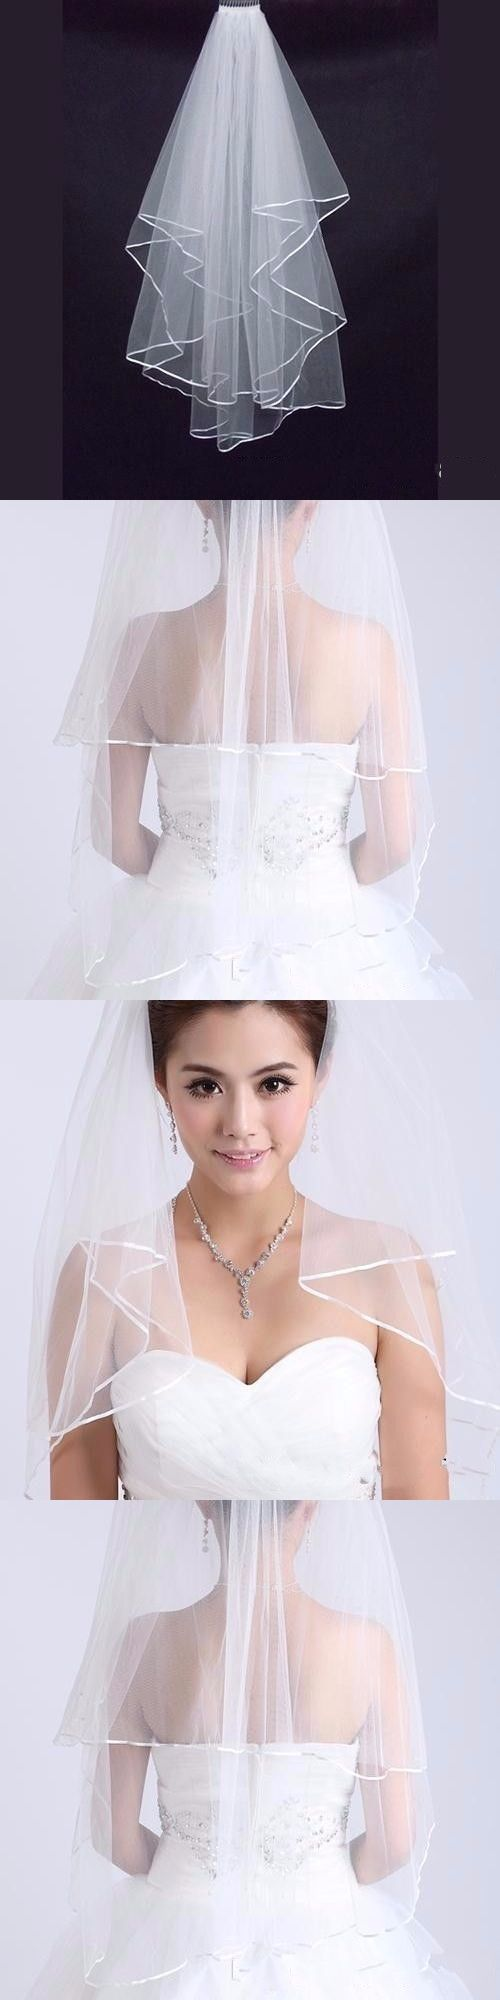 Bridal Veils 2017 Wedding Bridal Veils Tulle Ivory White Wedding Accessories Cheap velos de novia voile mariage